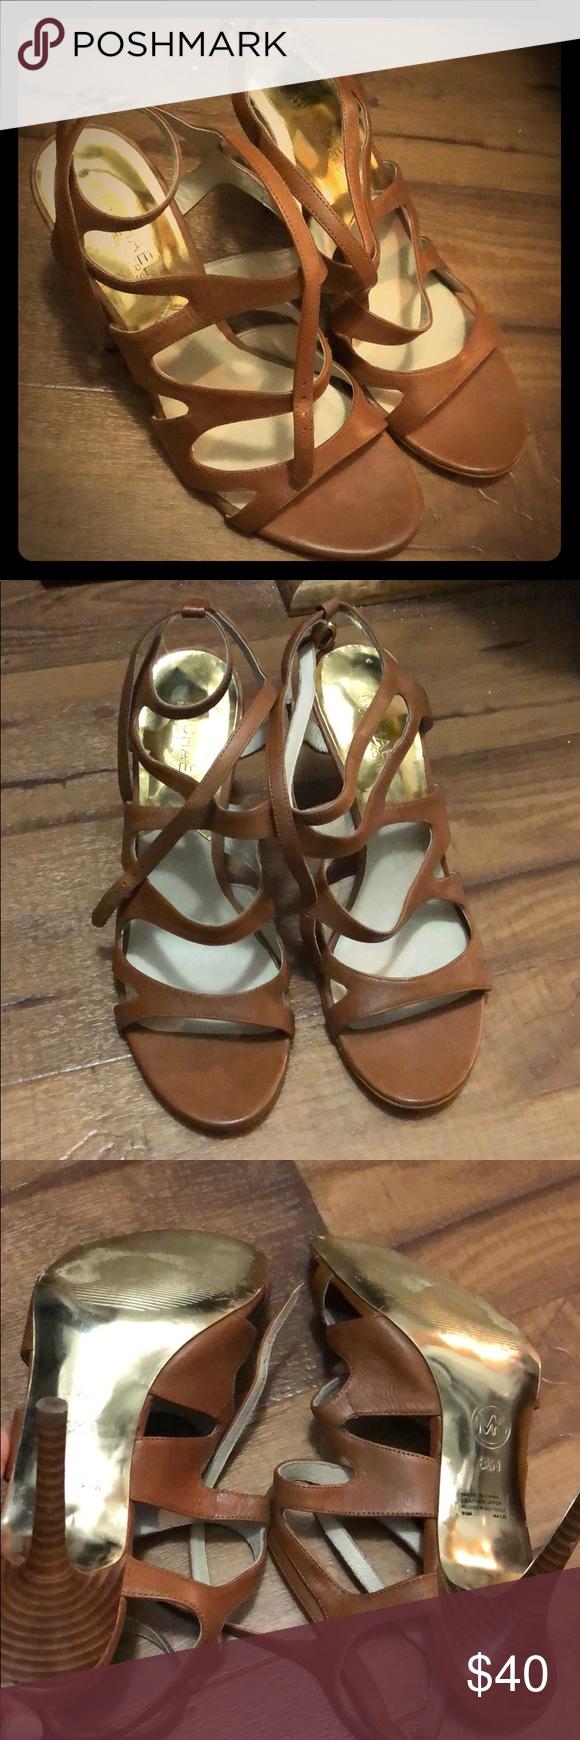 7beed9634cd Michael Kors Heels Tan Michael Kors heels worn once! MICHAEL Michael Kors  Shoes Heels